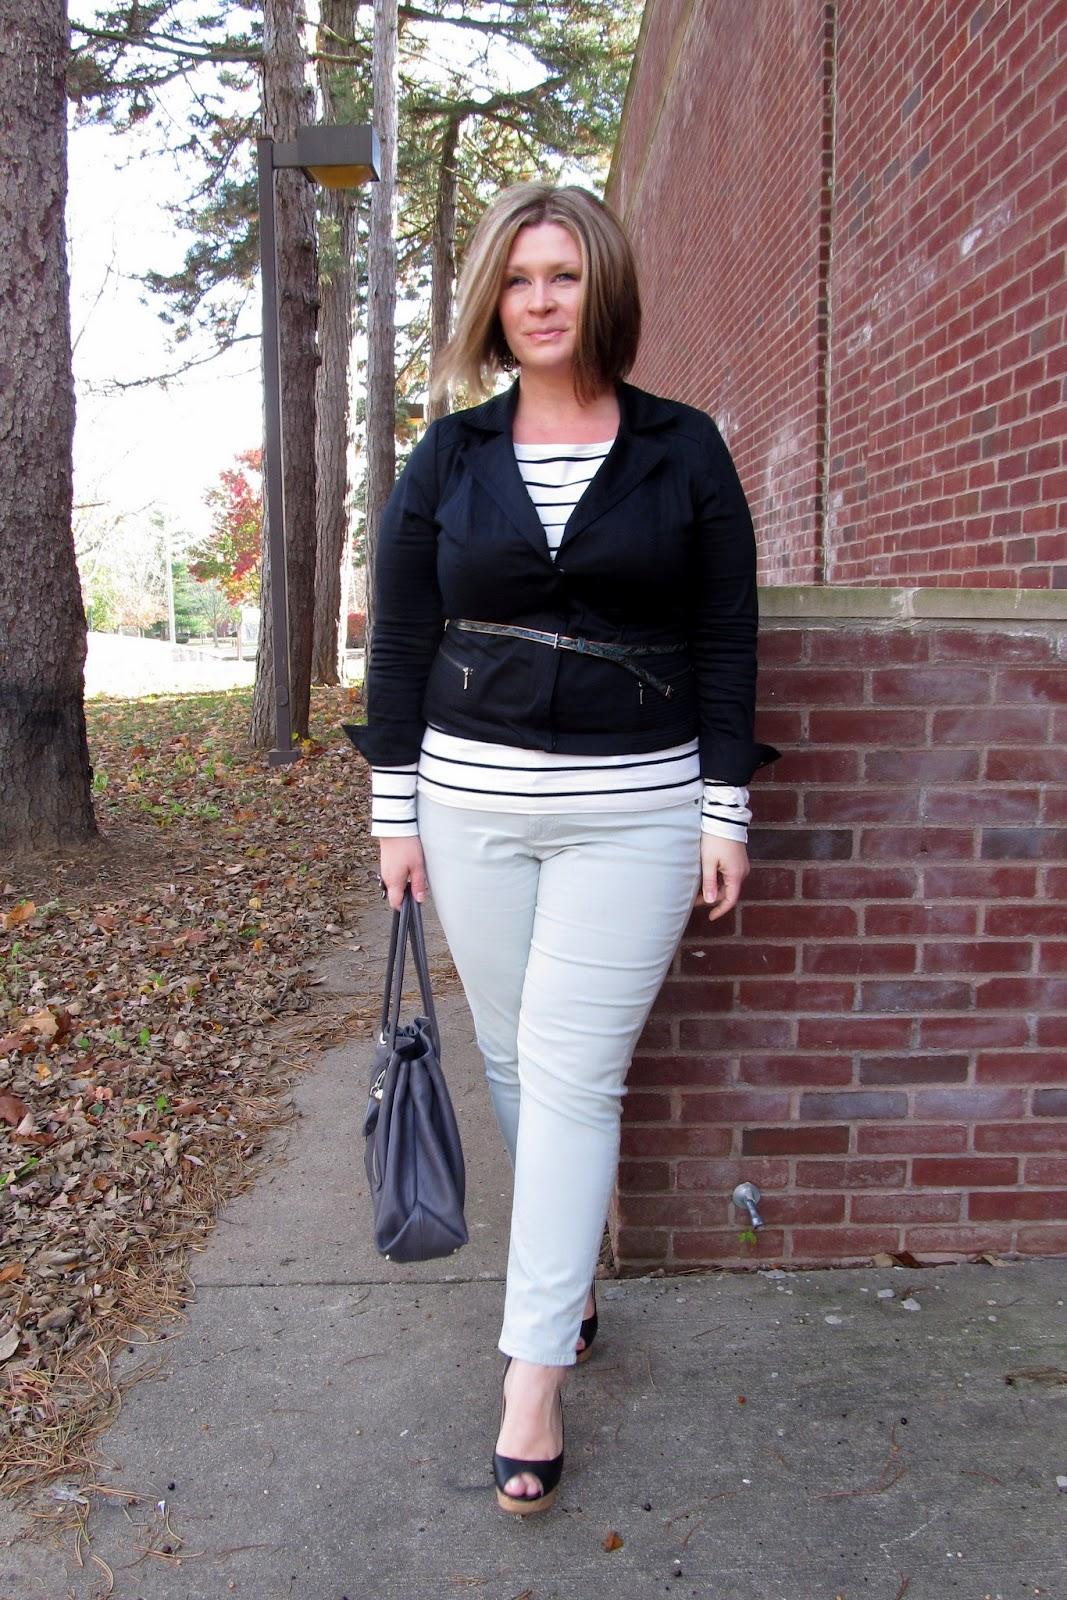 a206c7a3be3 Jacket - Lane Bryant   Striped tee - H M   Ankle pants - Talbots   Belt -  eloquii   Handbag - Furla (via Filene s Basement)   Sandals - Nine West